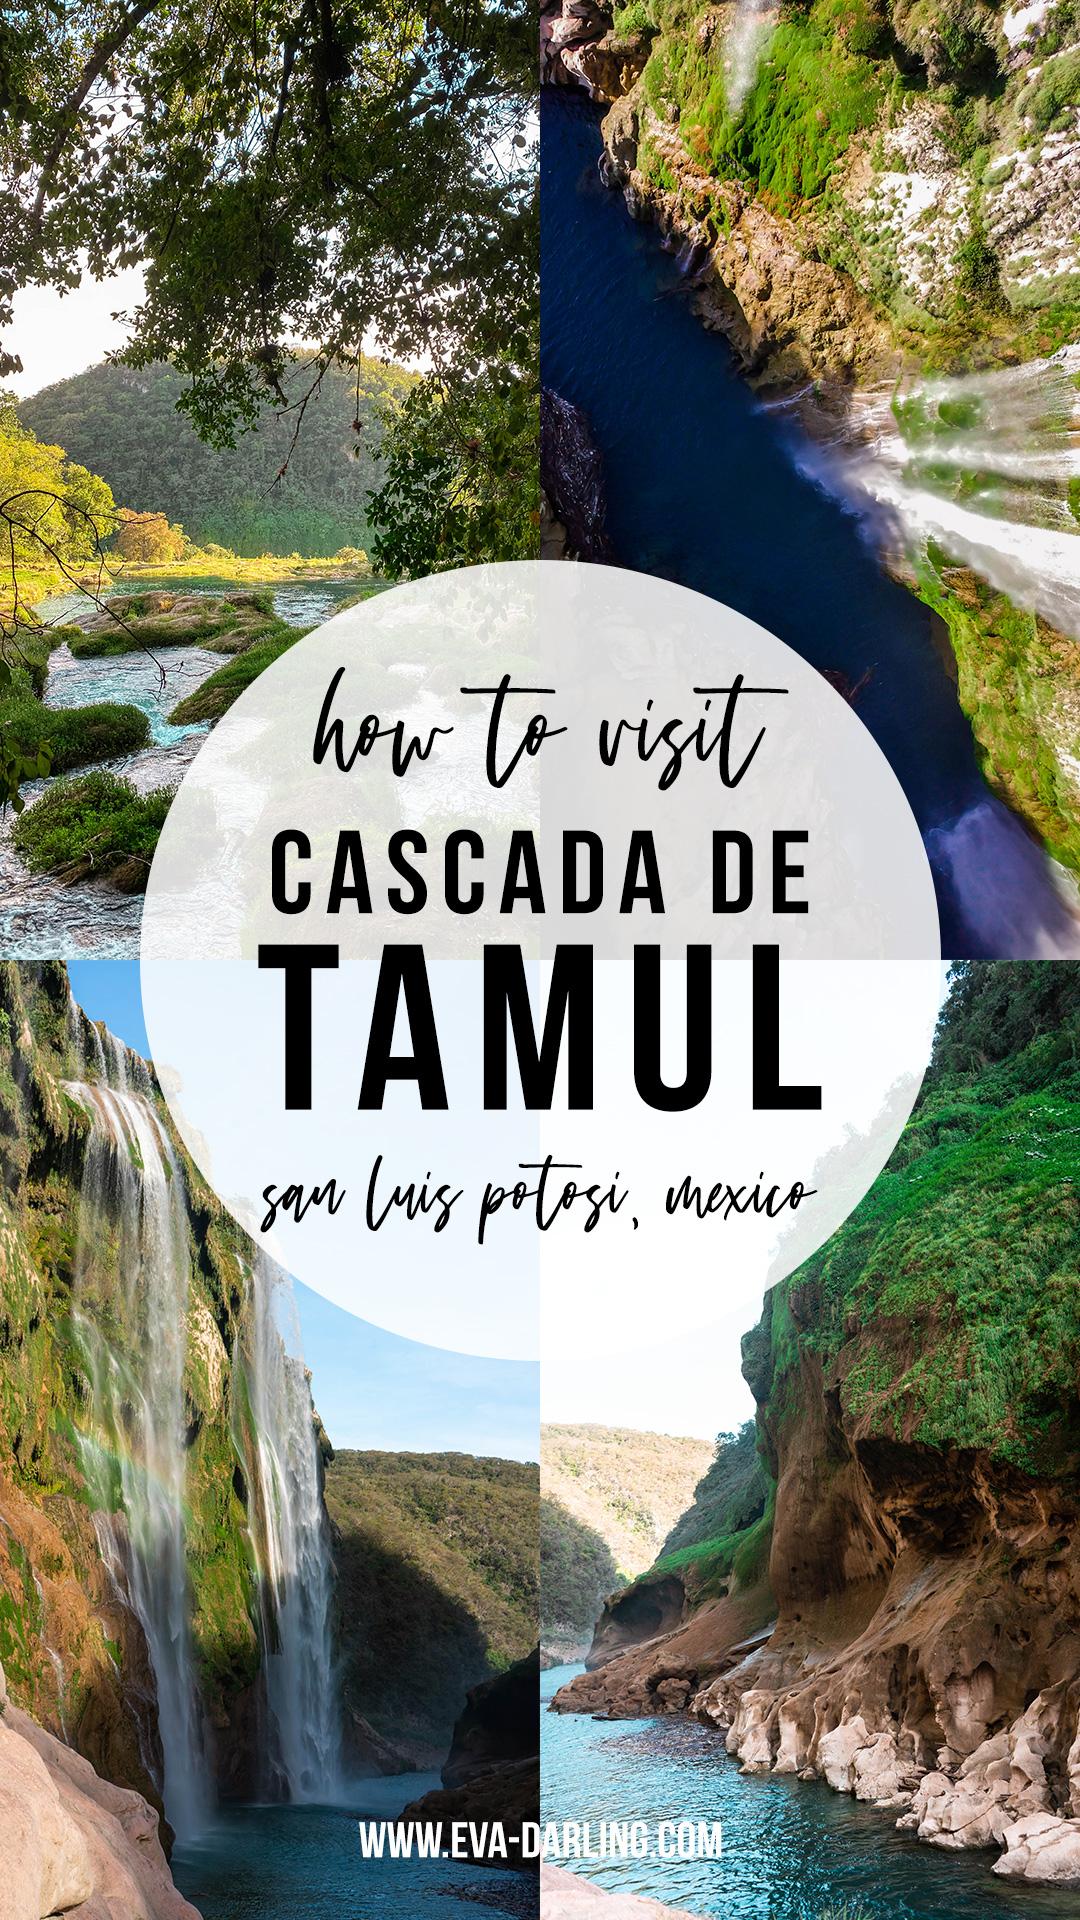 hidden gem mexico cascada de tamul waterfall hiking la huasteca potosina san luis potosi mexico travel guide instagrammable location slp off the beaten path el naranjito